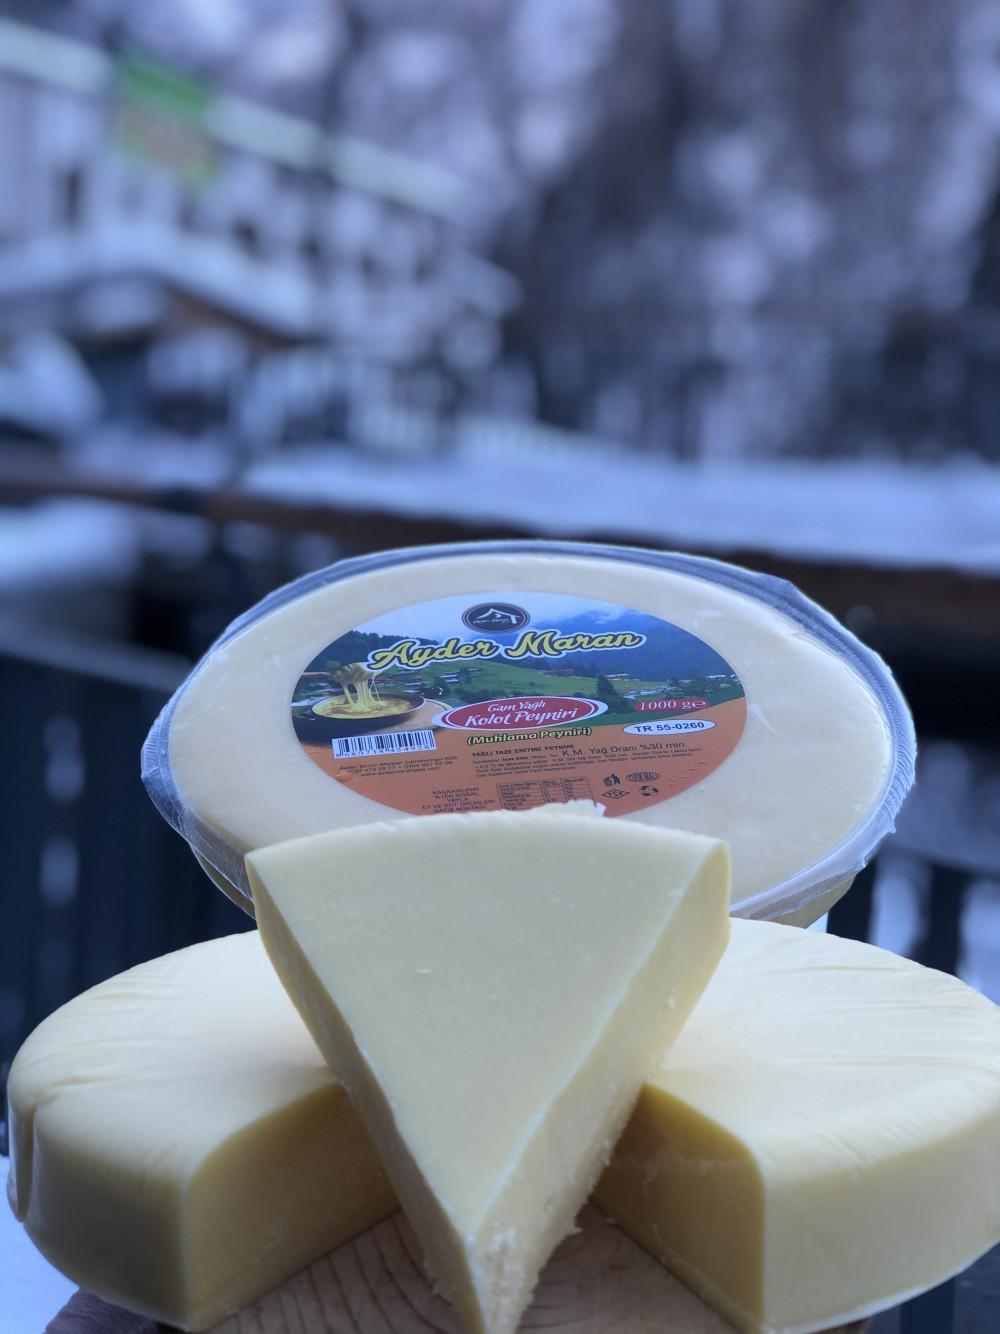 Ayder Kolot Peynir